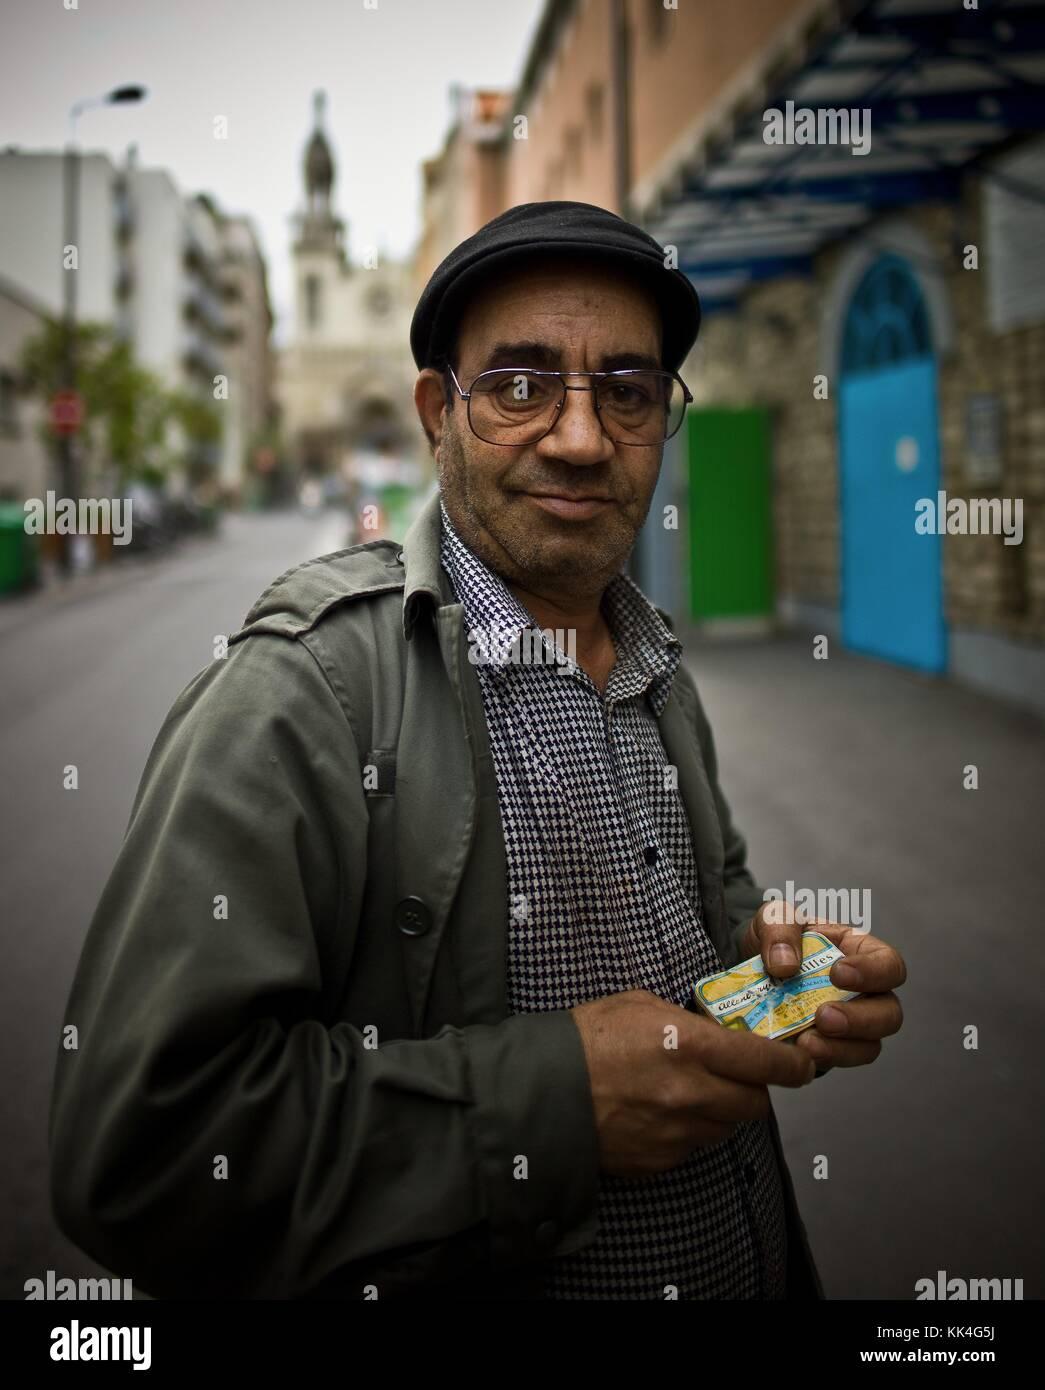 The breadcrumbs, the Emergency's Social Inclusion -  18/06/2012  -    -  Emergency Shelter  - La mie de Pain, Paris Stock Photo